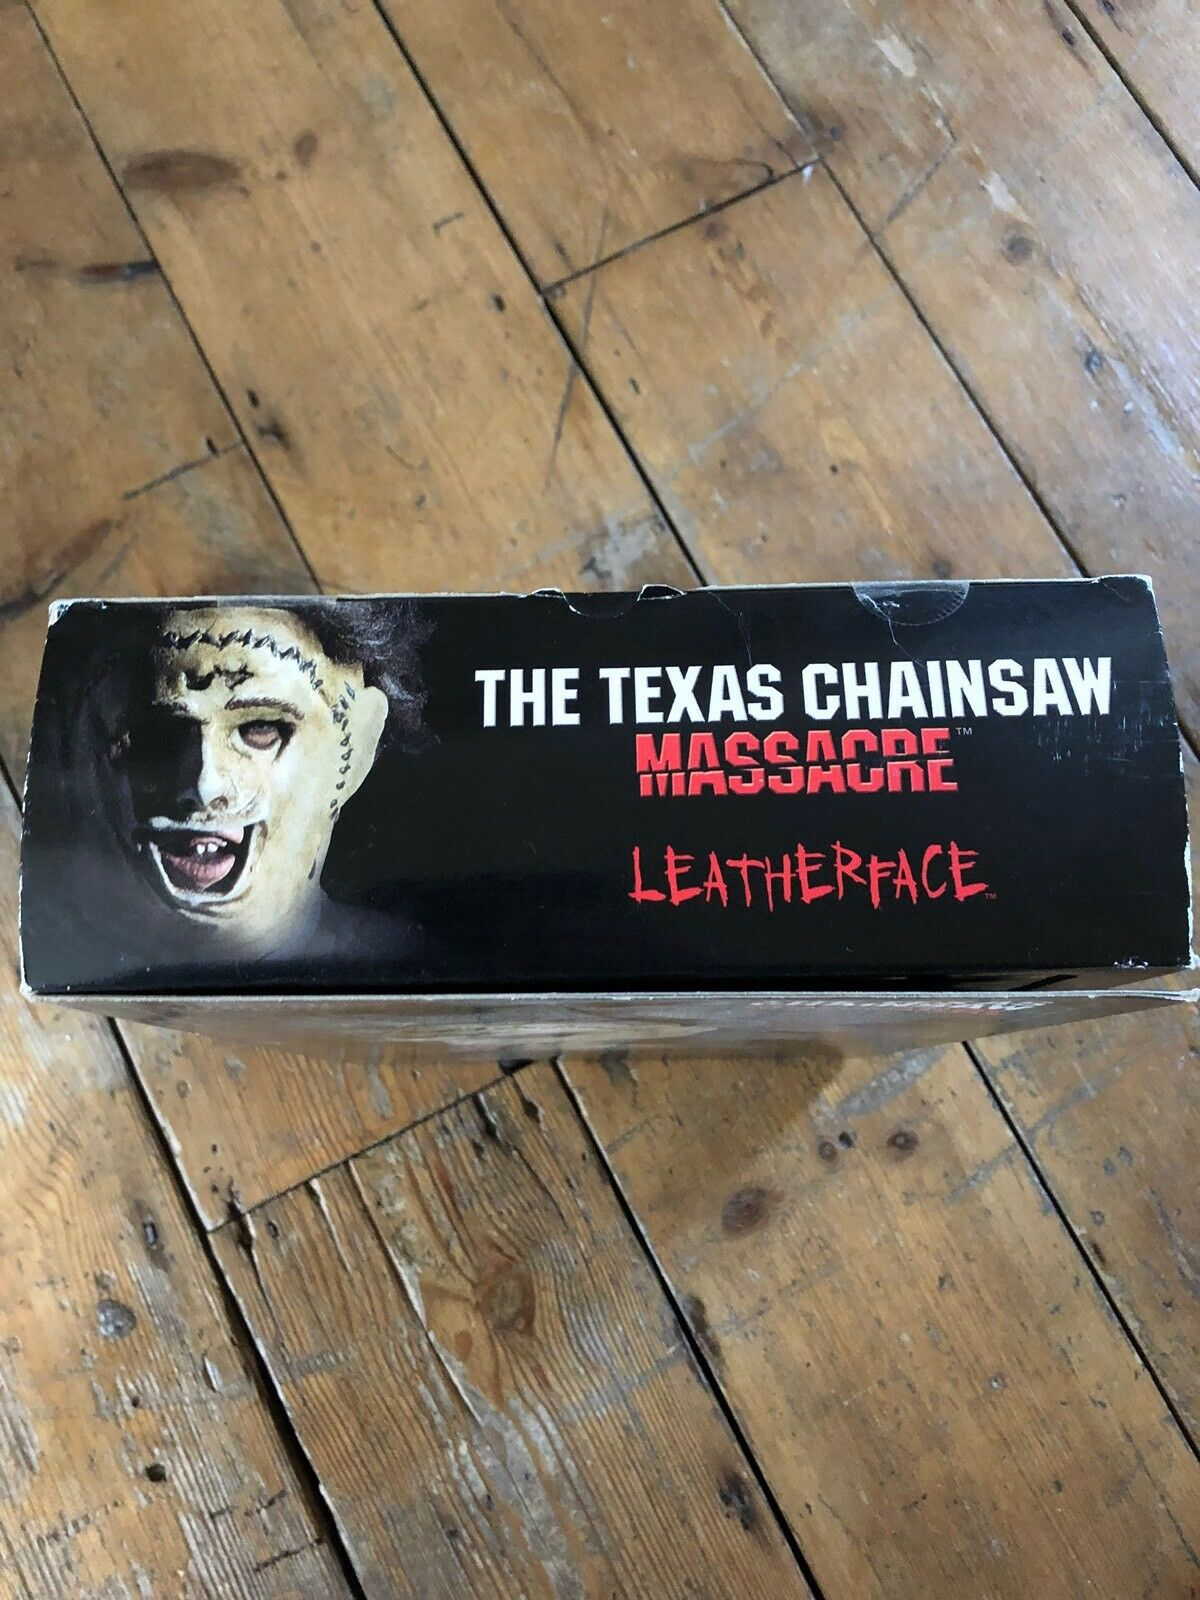 Sideshow Texas Chainsaw Massacre Lederface Gunnar Hansen    AFSSC109 6ae157